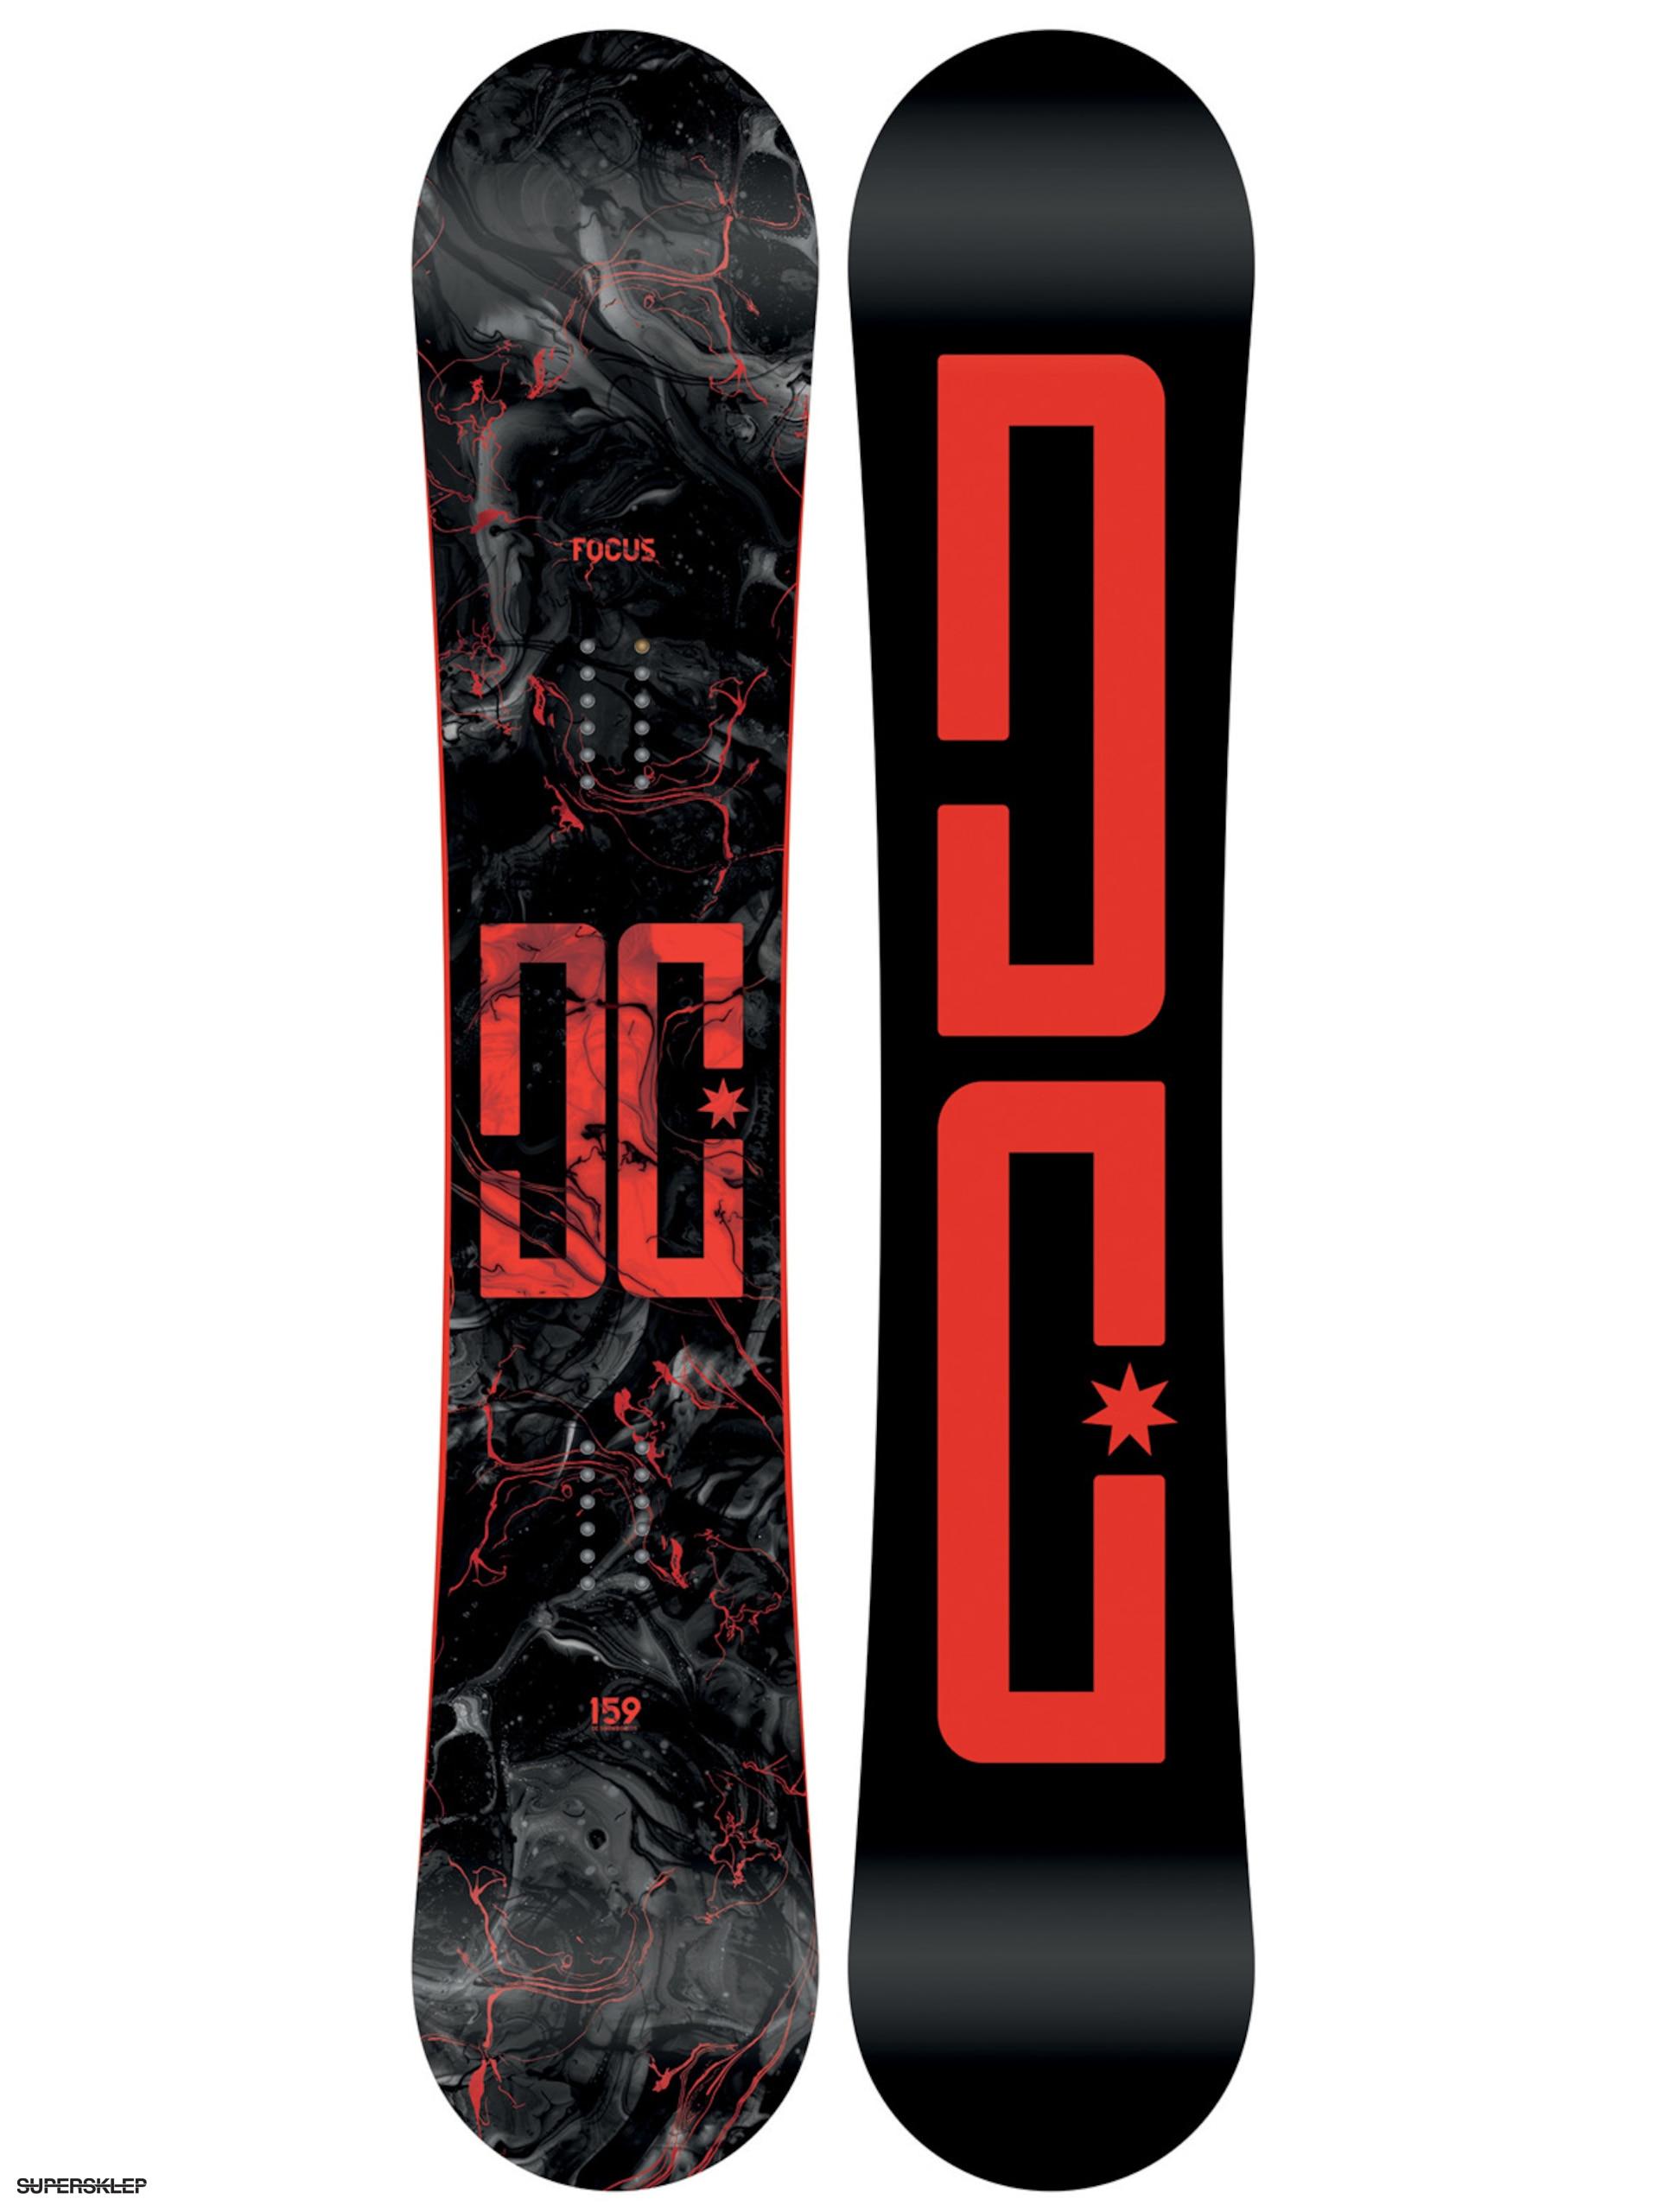 f4c4bf1e87f2c Snowboard DC Focus (black/red)